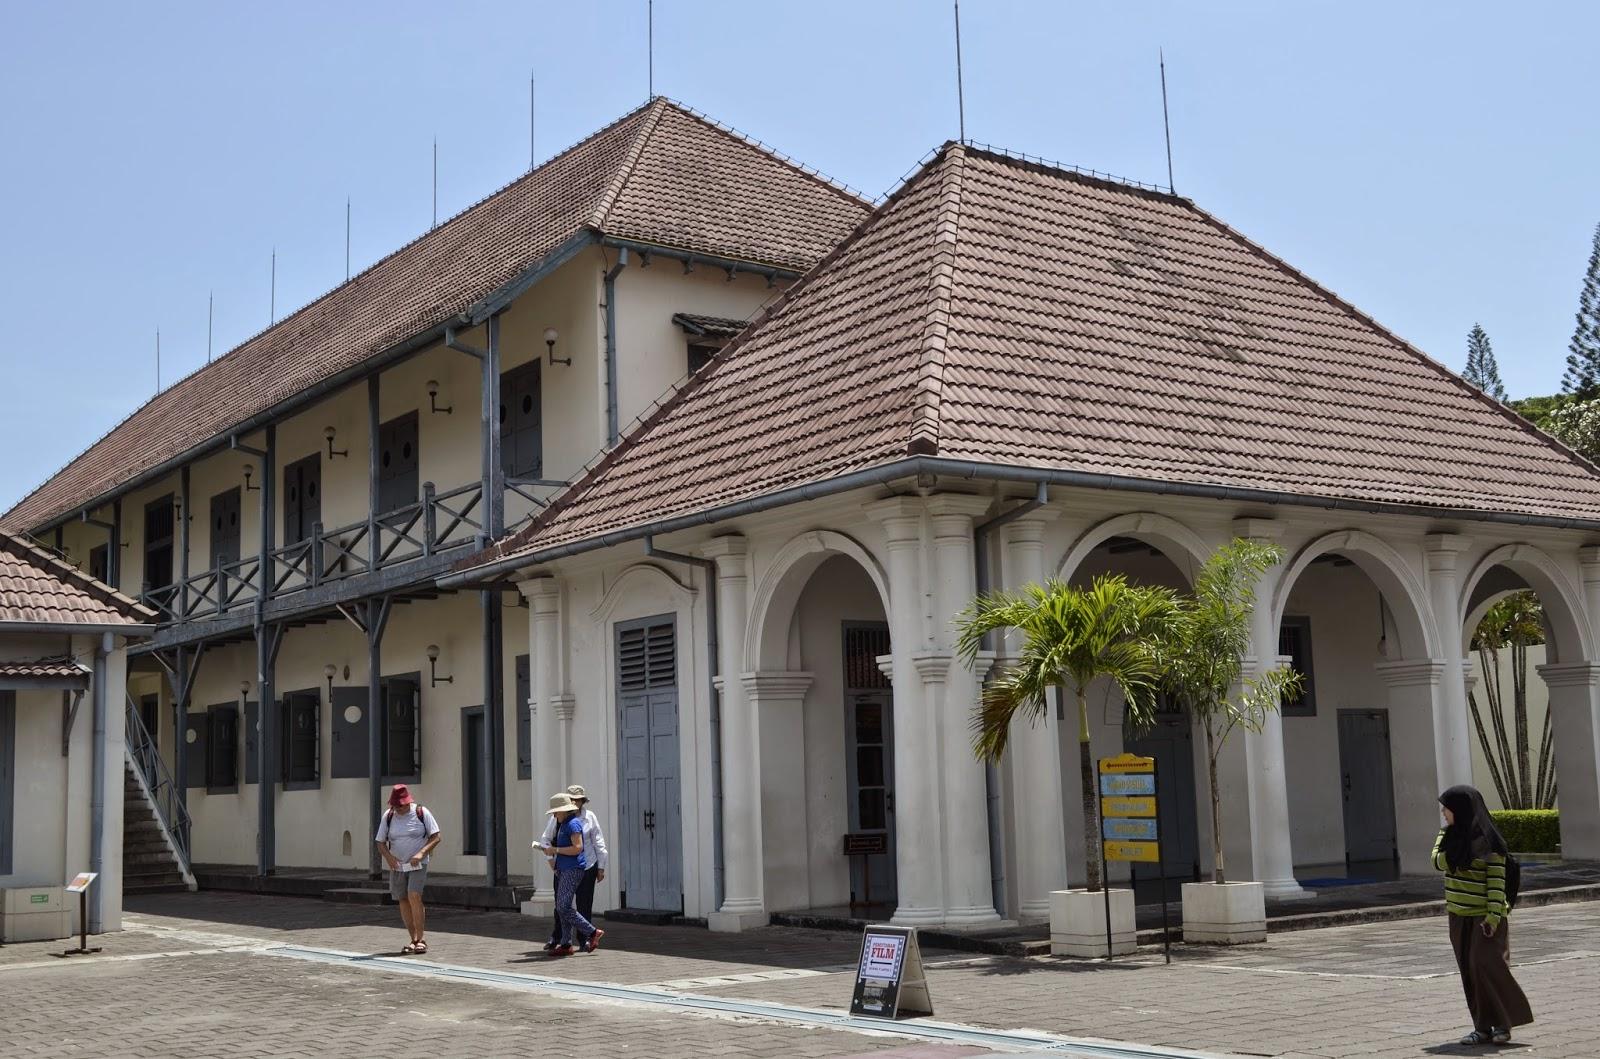 Berkeliling Museum Benteng Vredeburg Yogyakarta Bluepacker Indonesia Kota